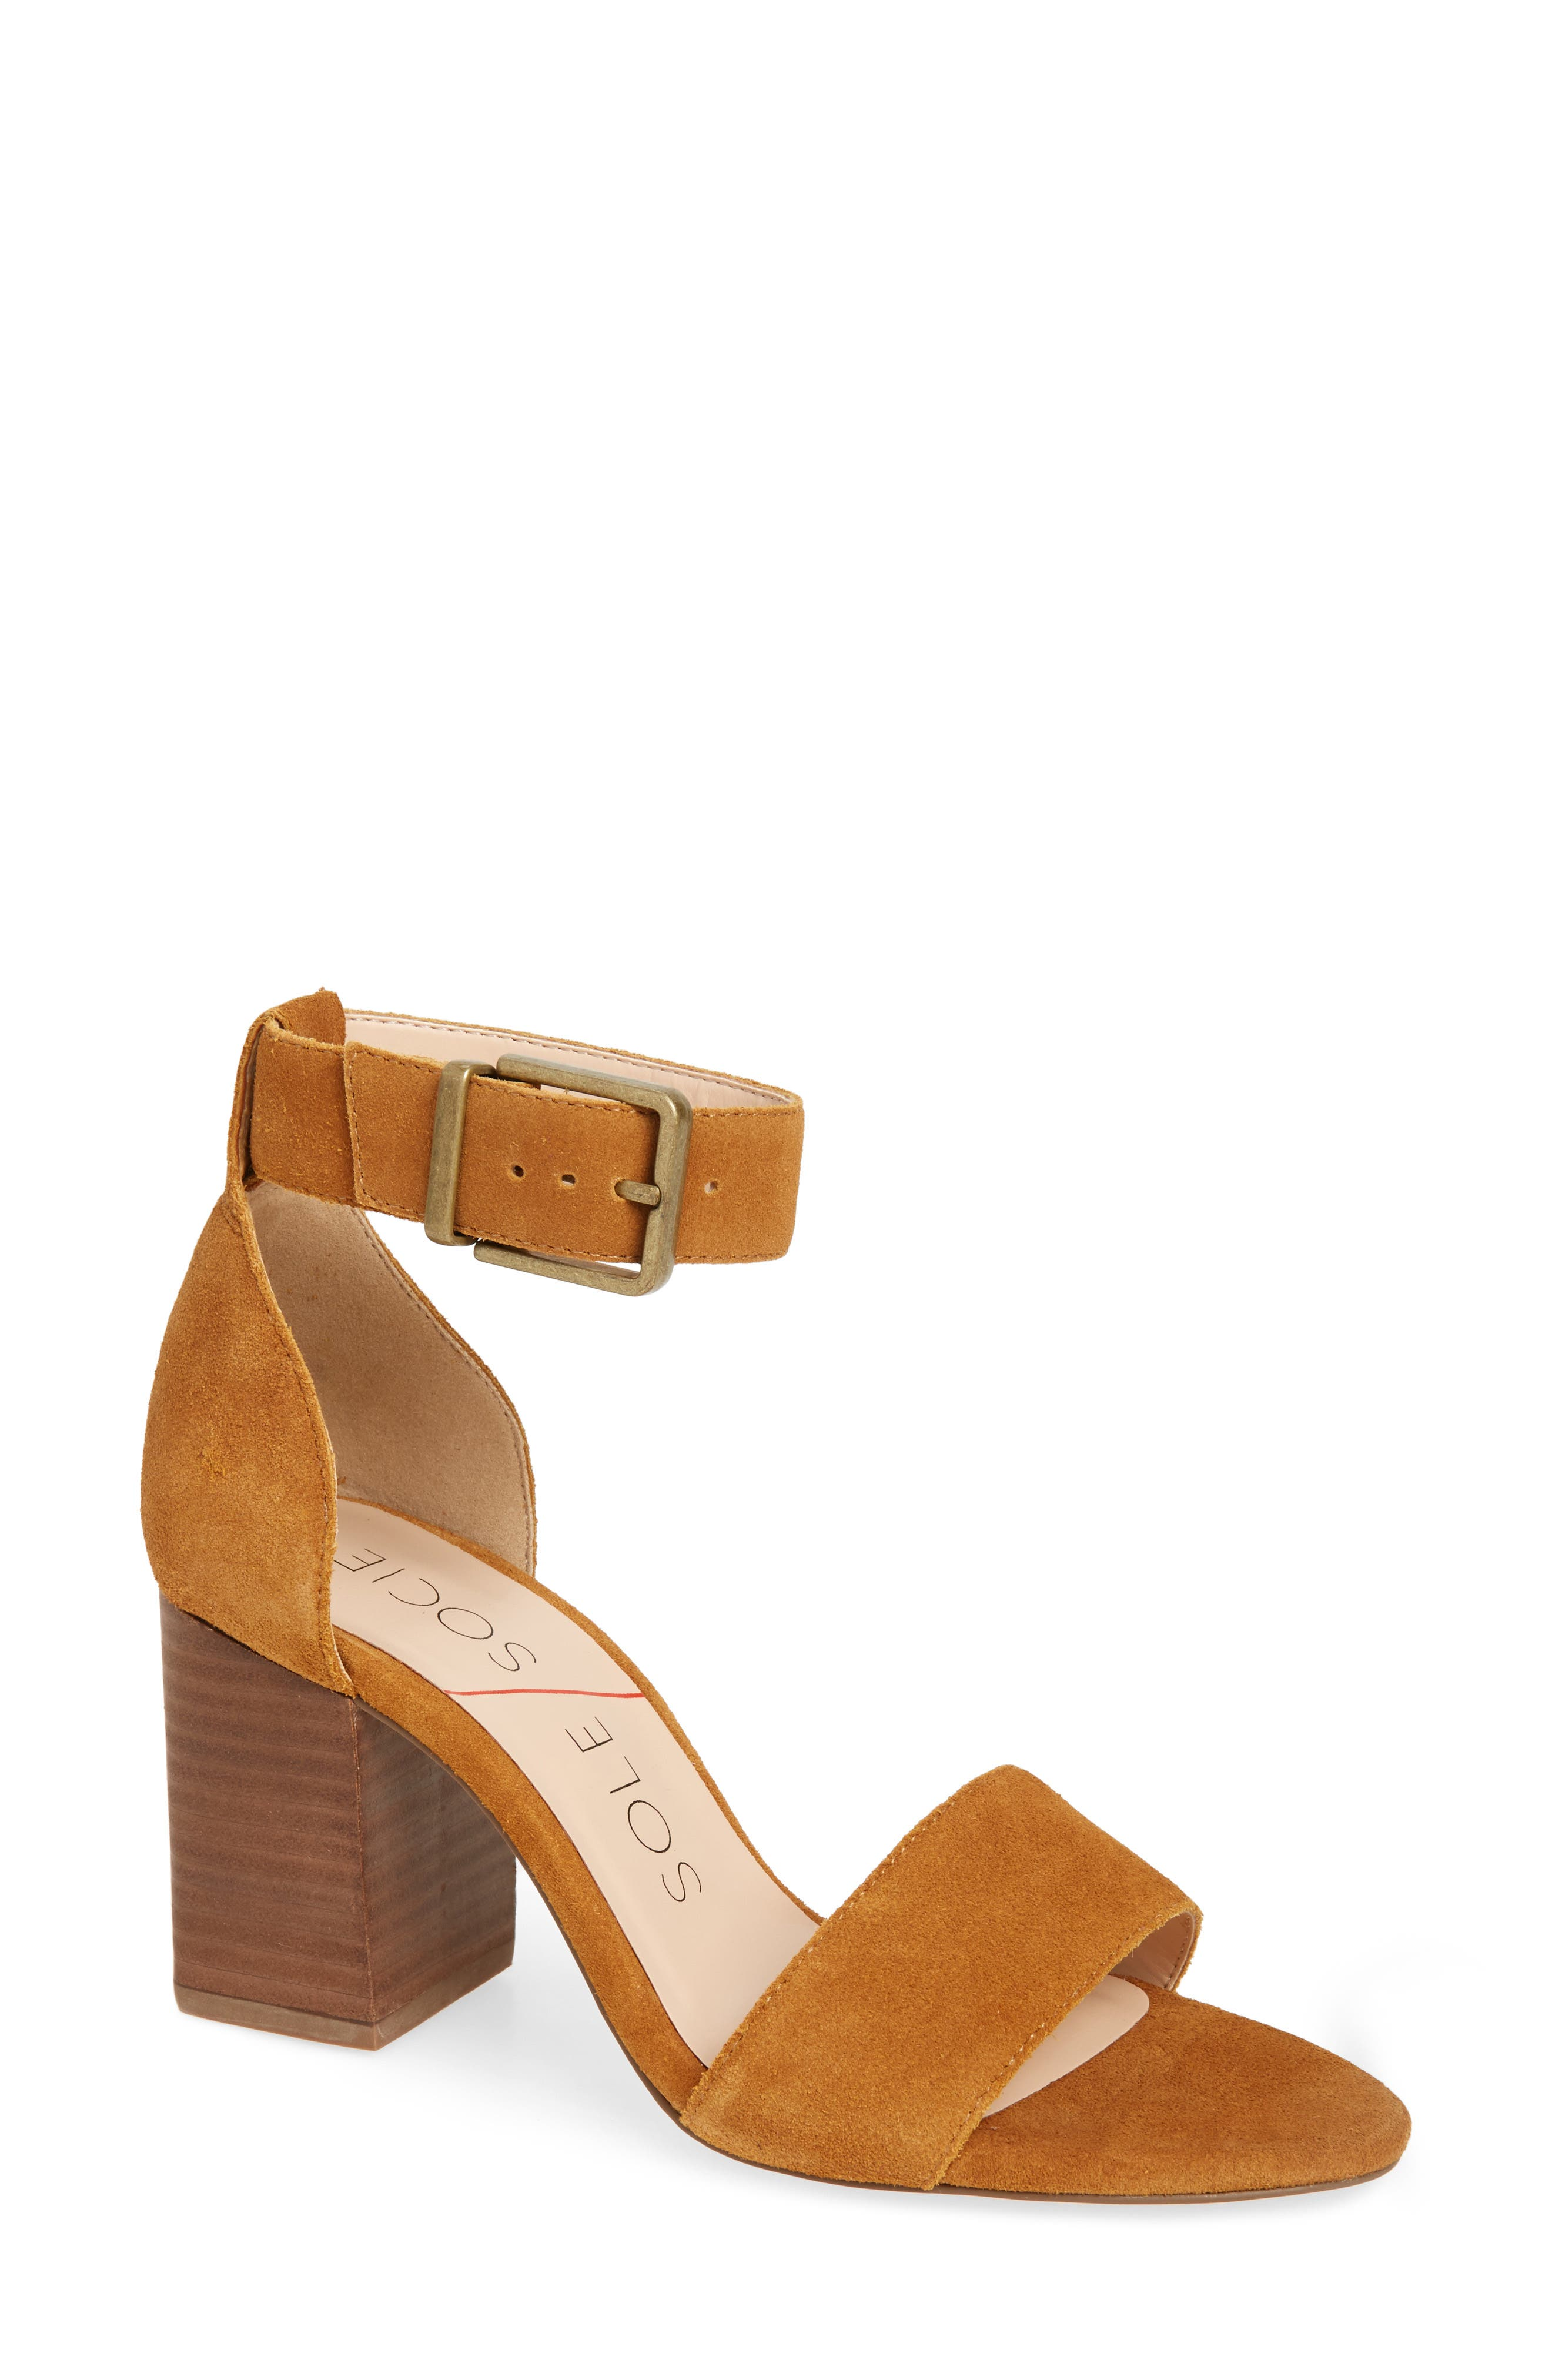 Main Image - Sole Society Montana Sandal (Women)